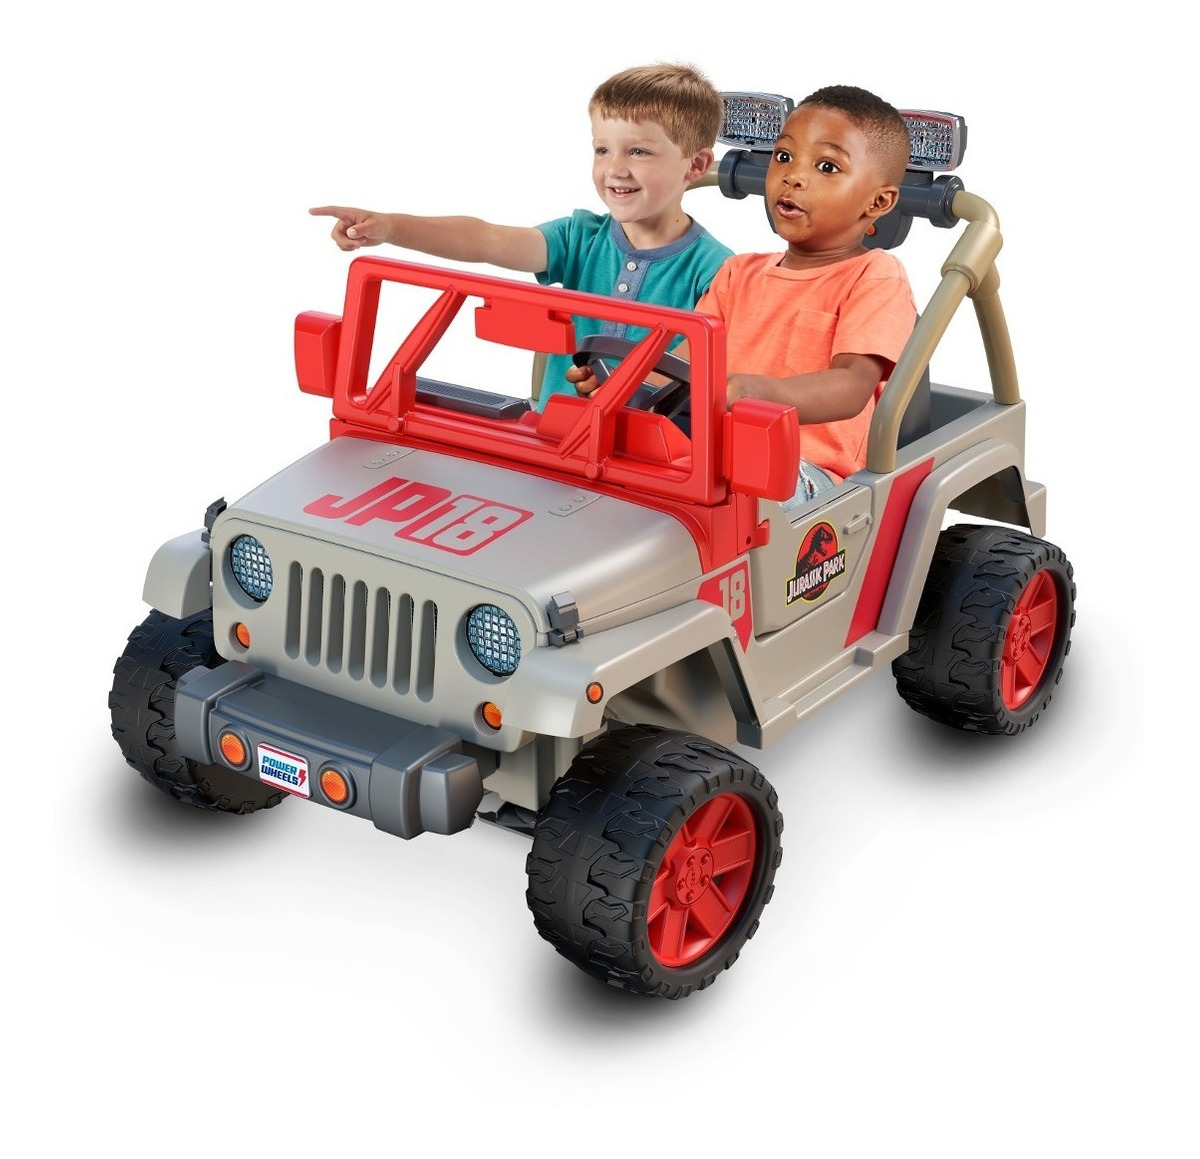 Auto Electrico Jeep Jurassic Park Power Wheels 2 393 550 En